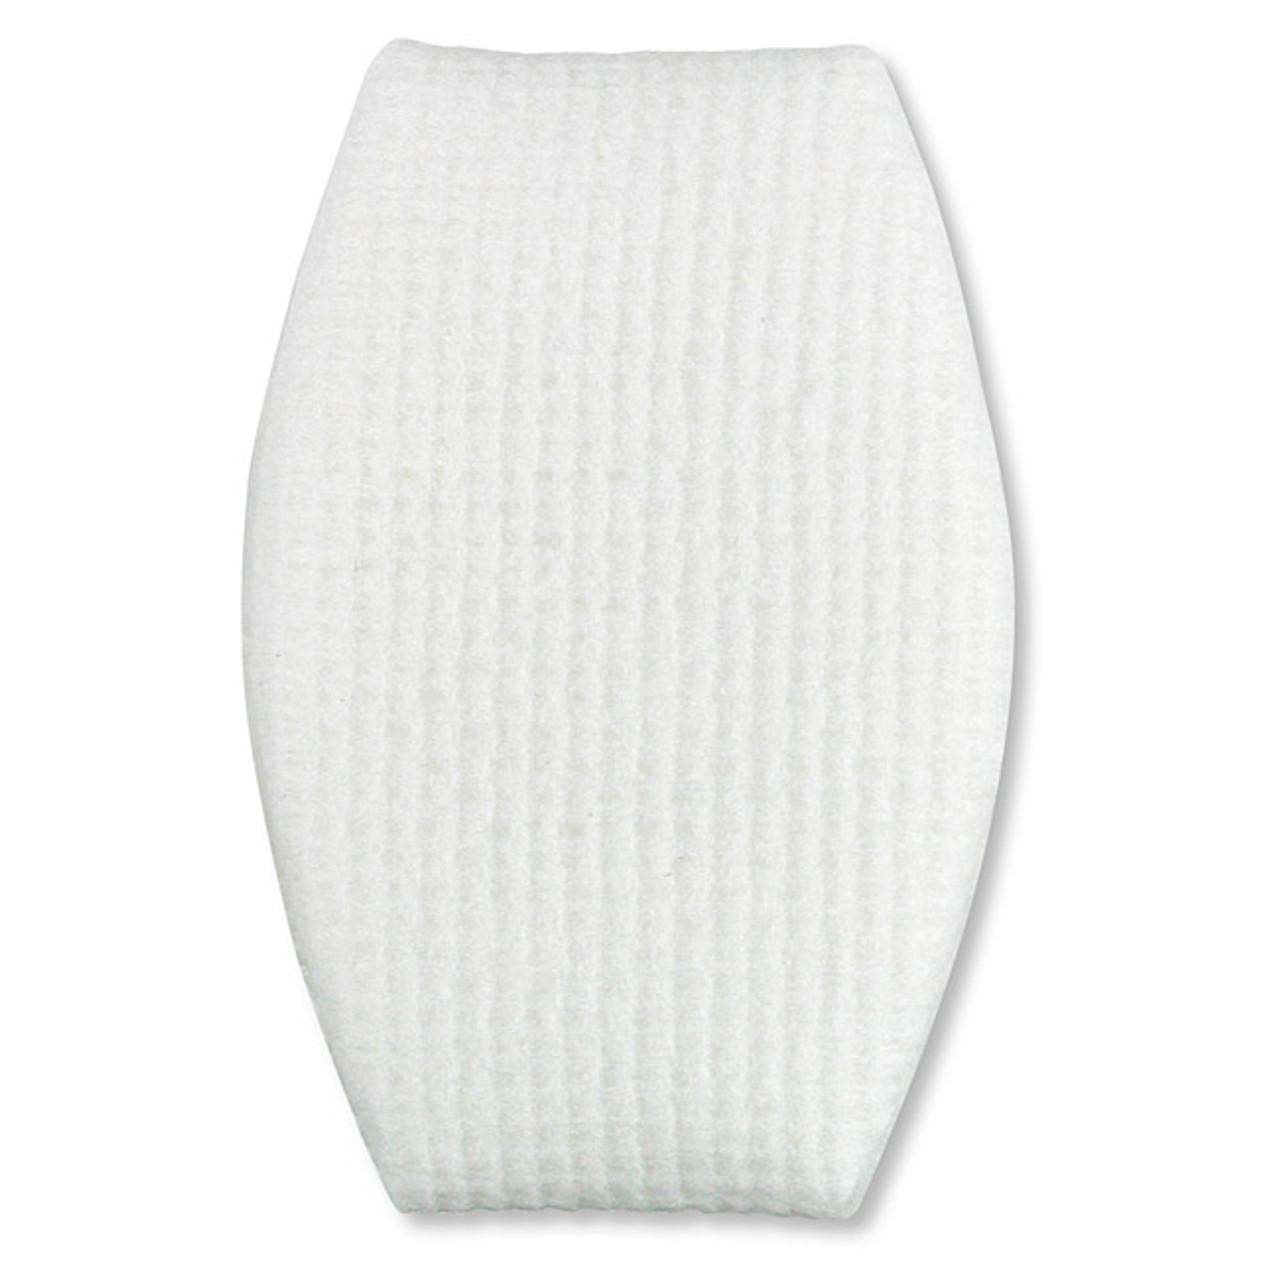 Oval Eye Pads - 50/Box